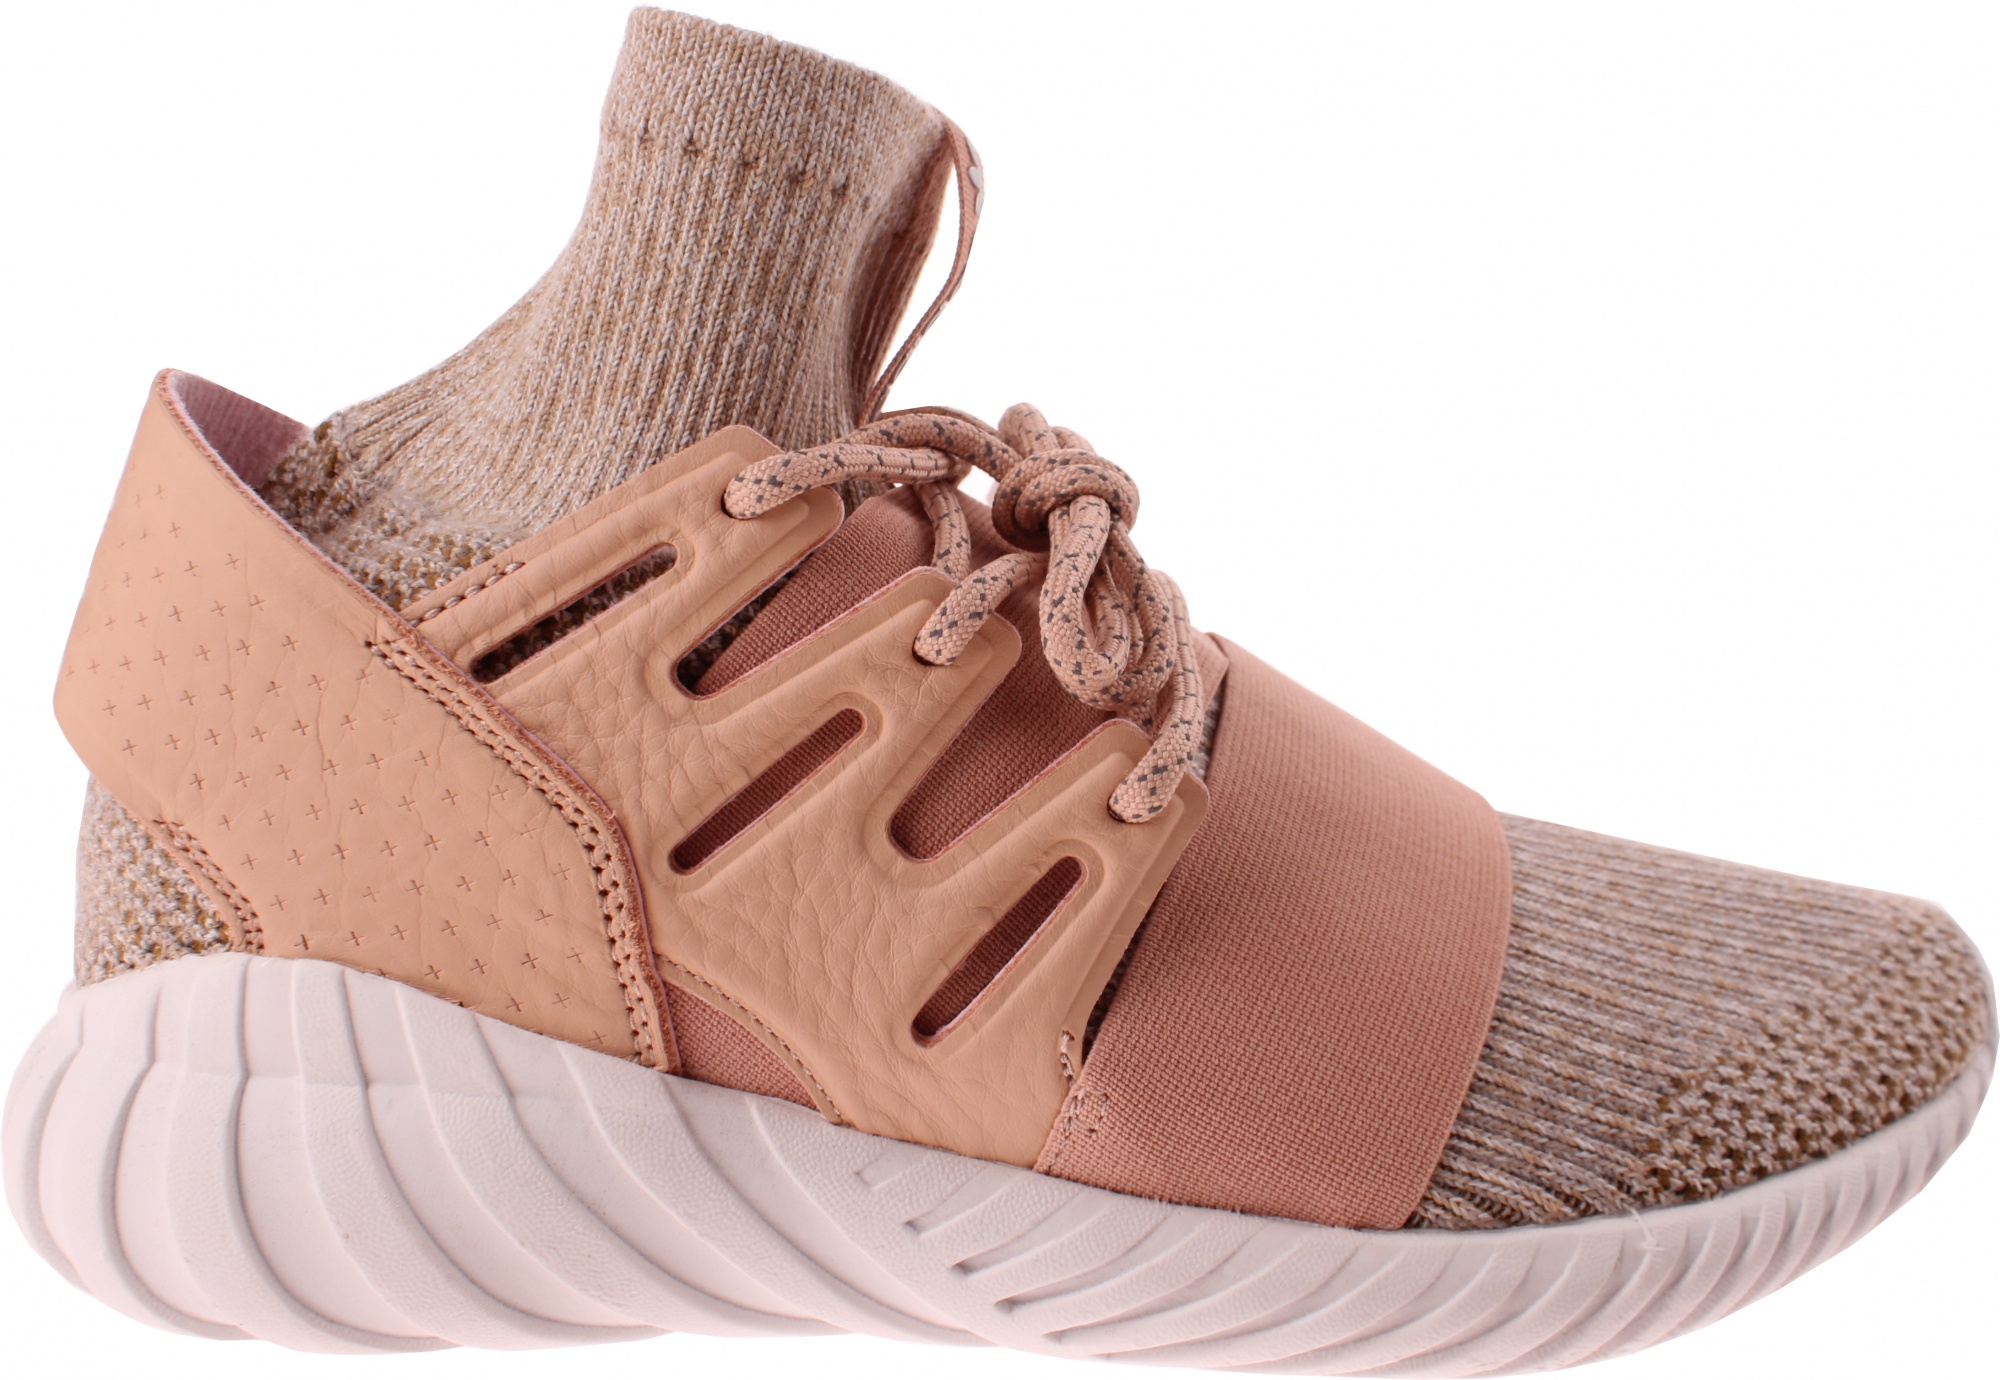 0e7f8690 adidas sneakers Tubular Doom men's brown / salmon pink - Internet ...